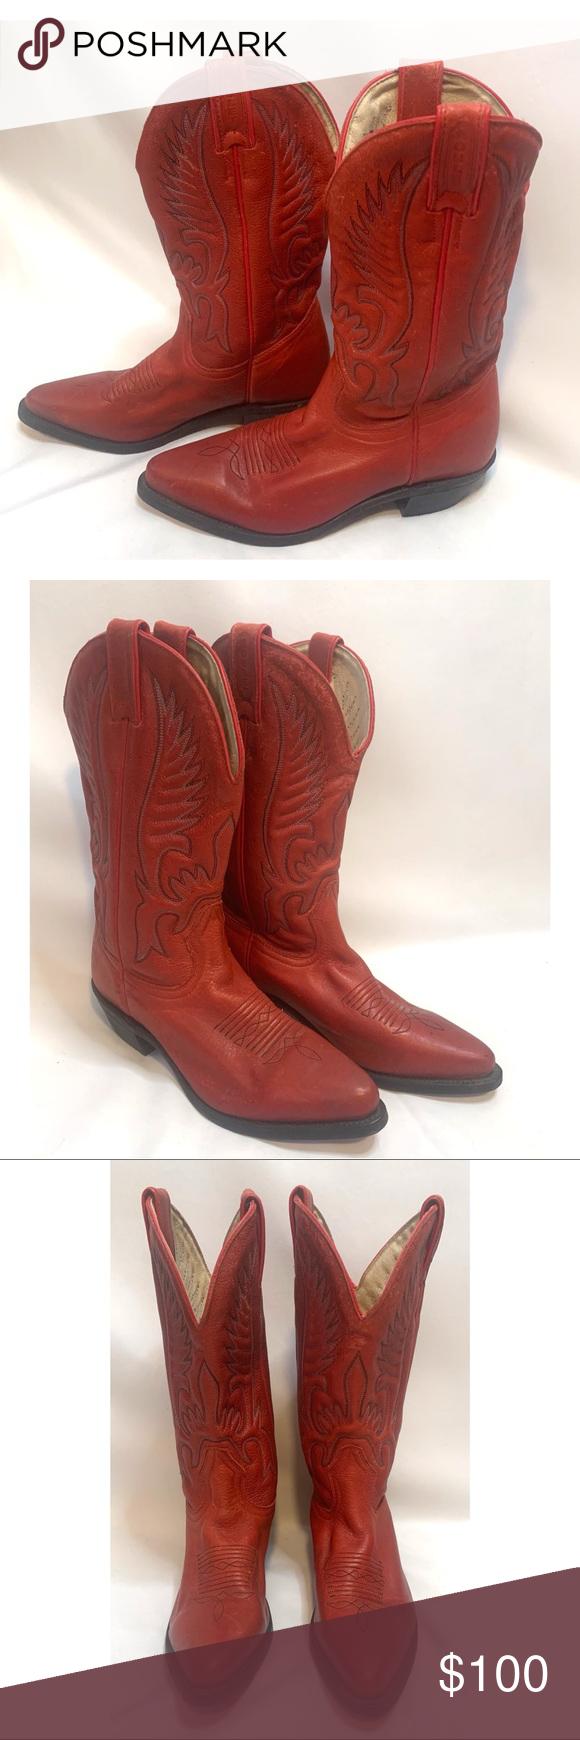 Boulet vintage size 6.5 women's red cowboy boots Boulet vintage size 6.5 women…